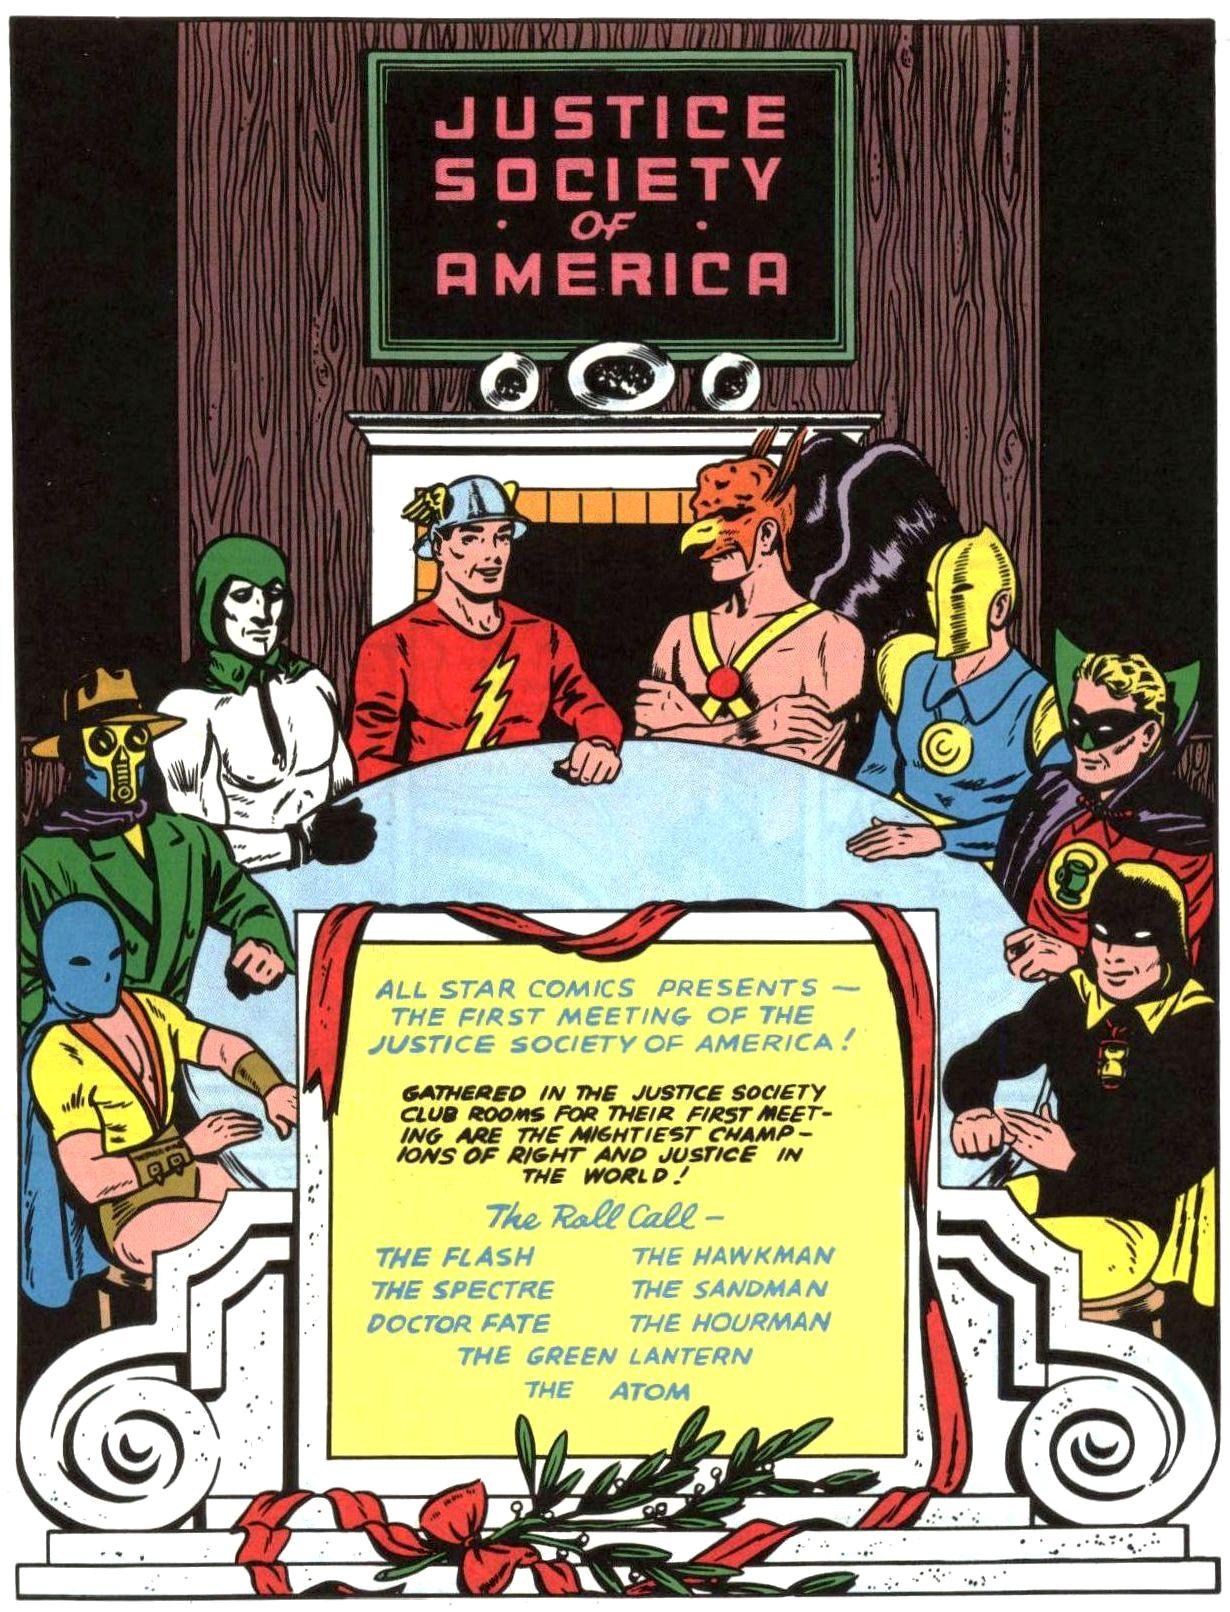 Justice Society Origins